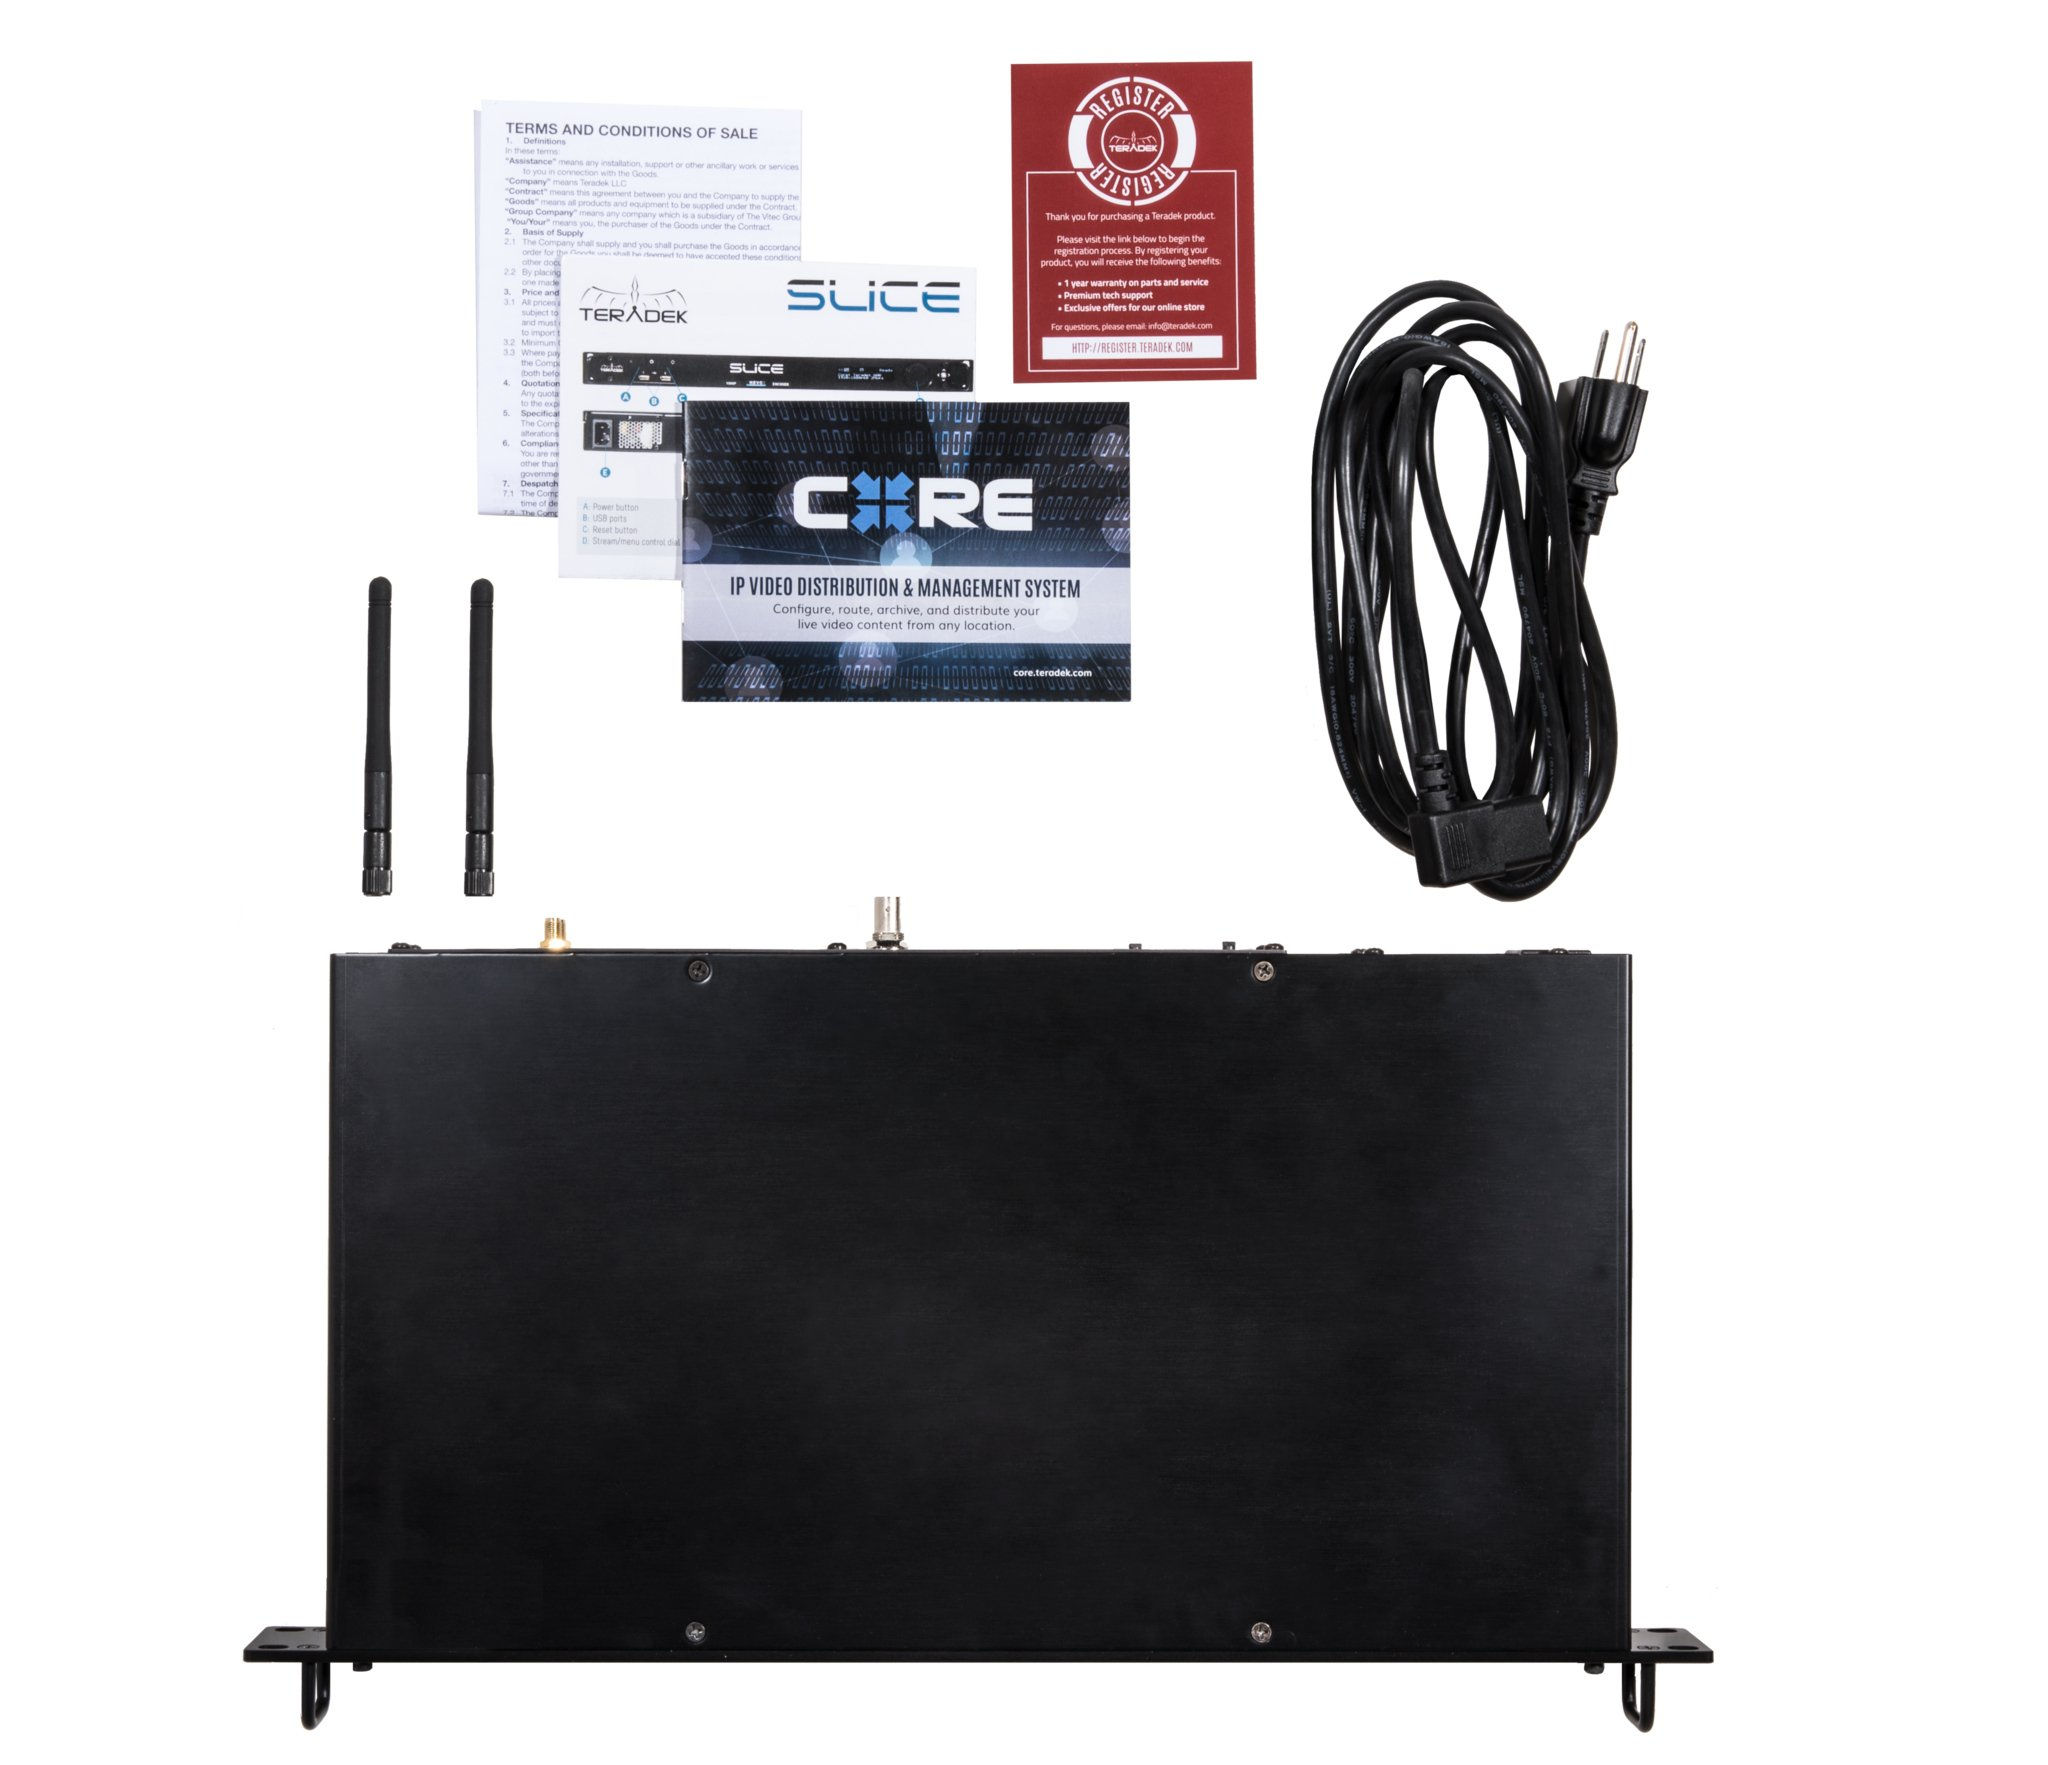 SDI/HDMI Rack-Mount H.264 Encoder with Wi-Fi & Ethernet